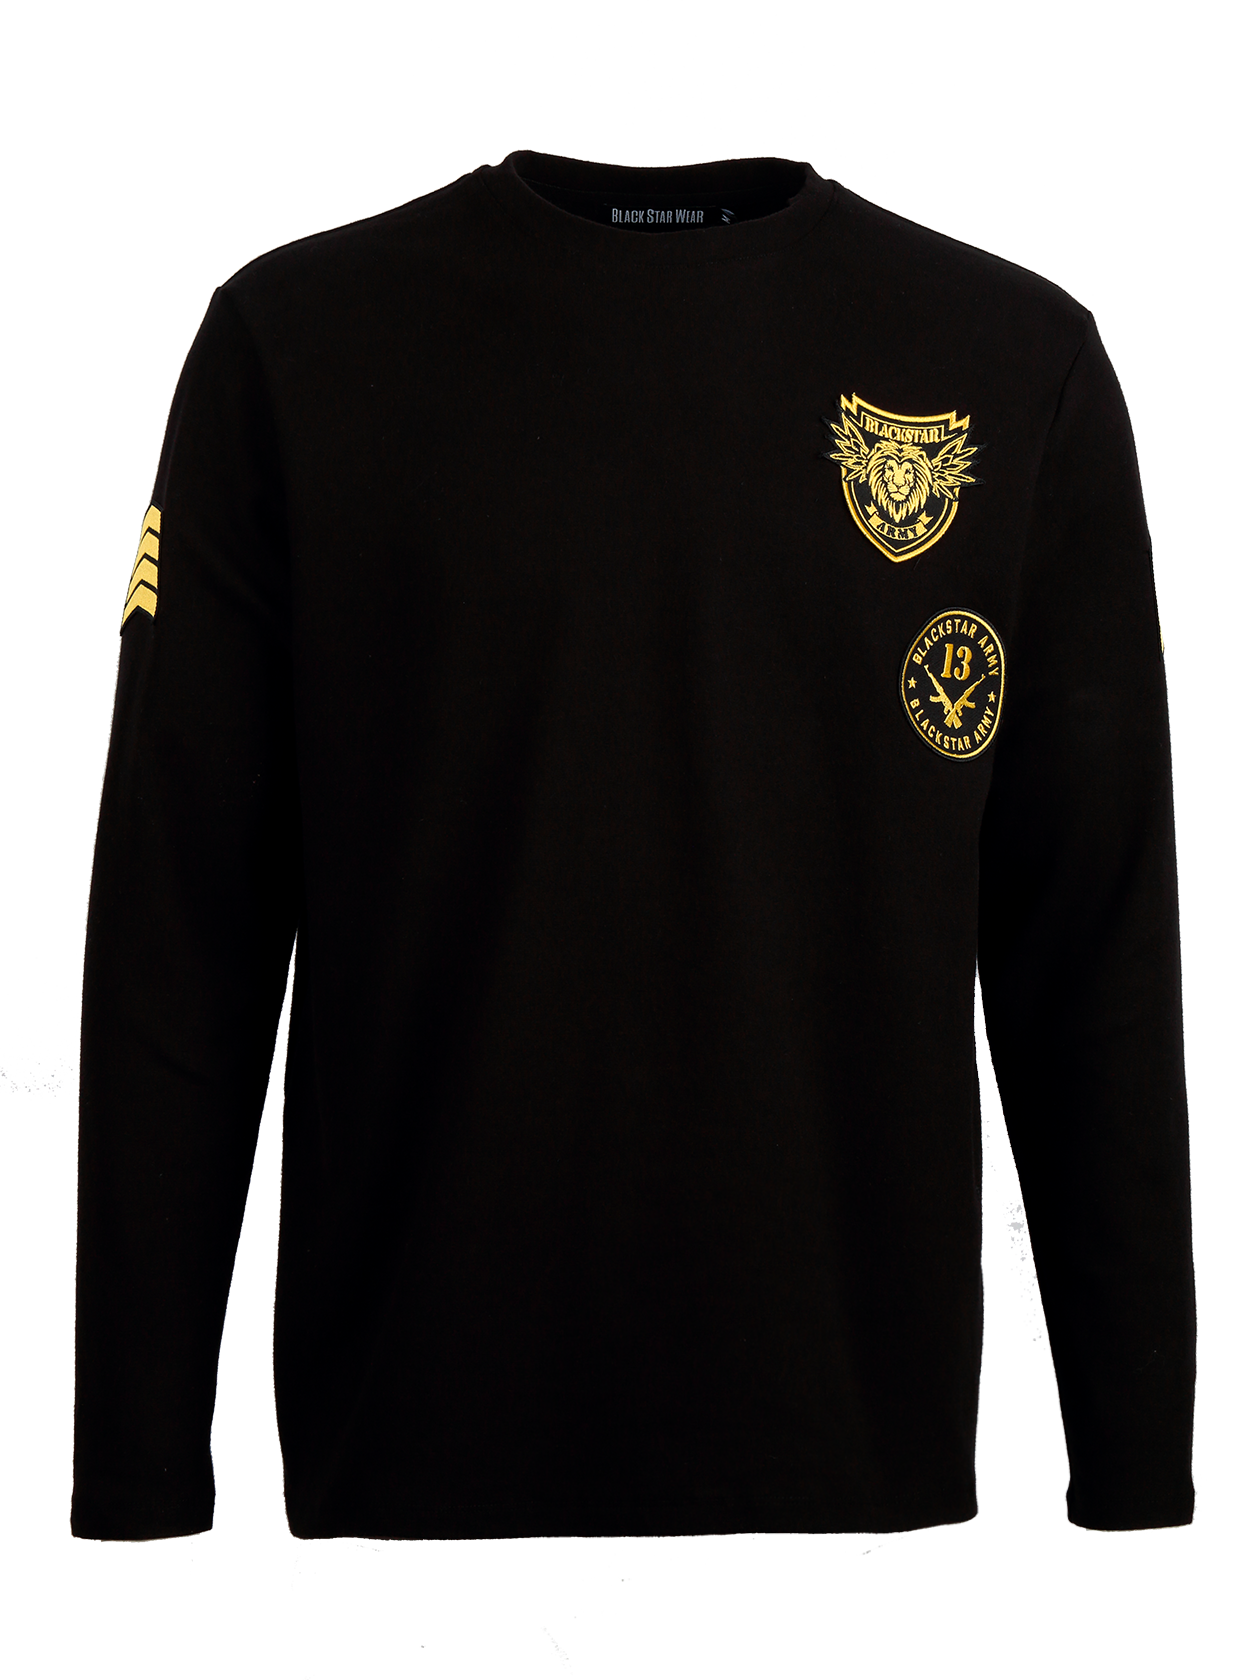 Mens long sleeve t-shirt Black Star Army